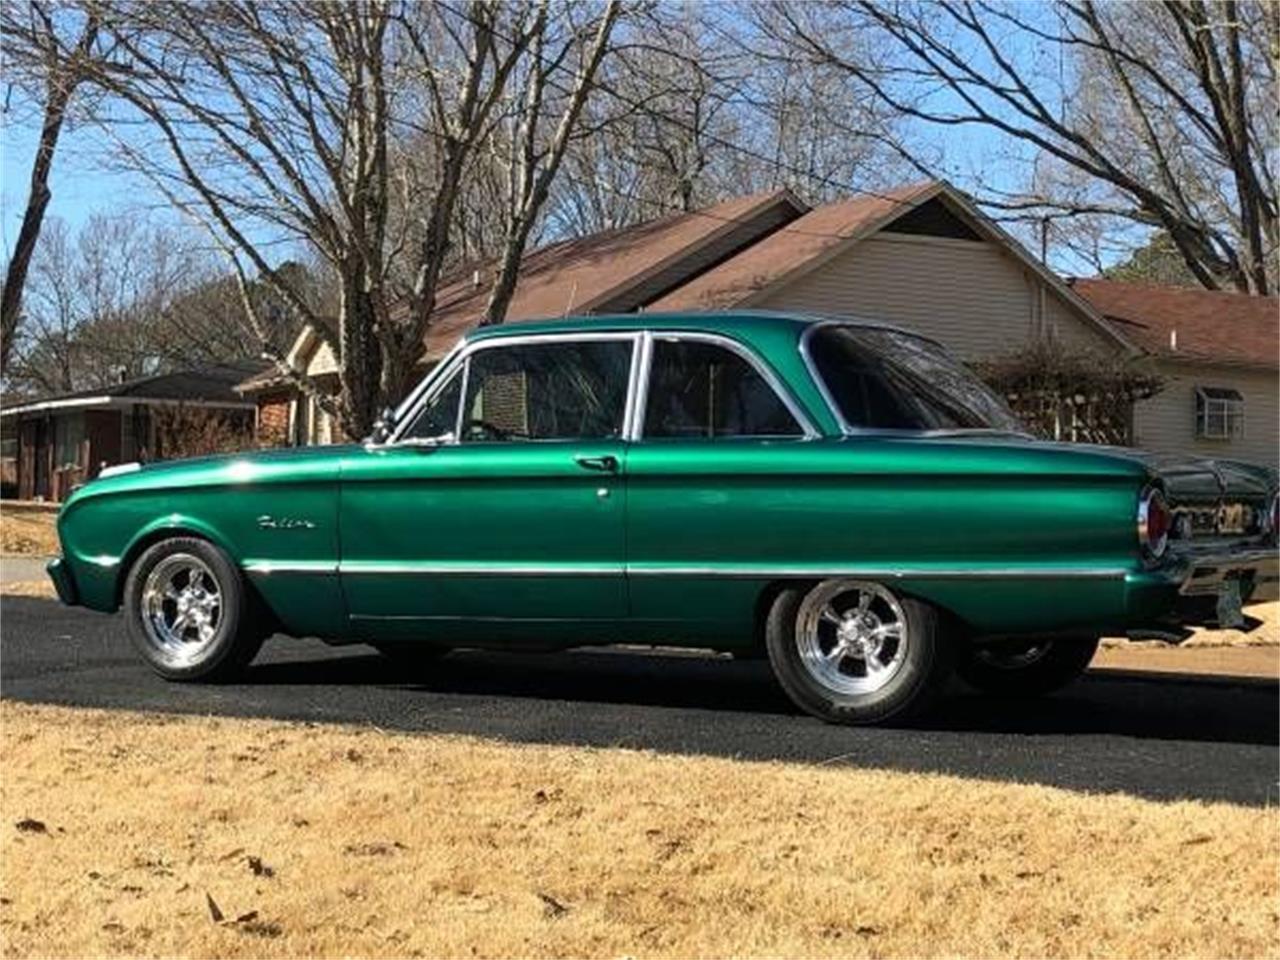 1962 Ford Falcon For Sale In Cadillac Mi Classiccarsbay Com